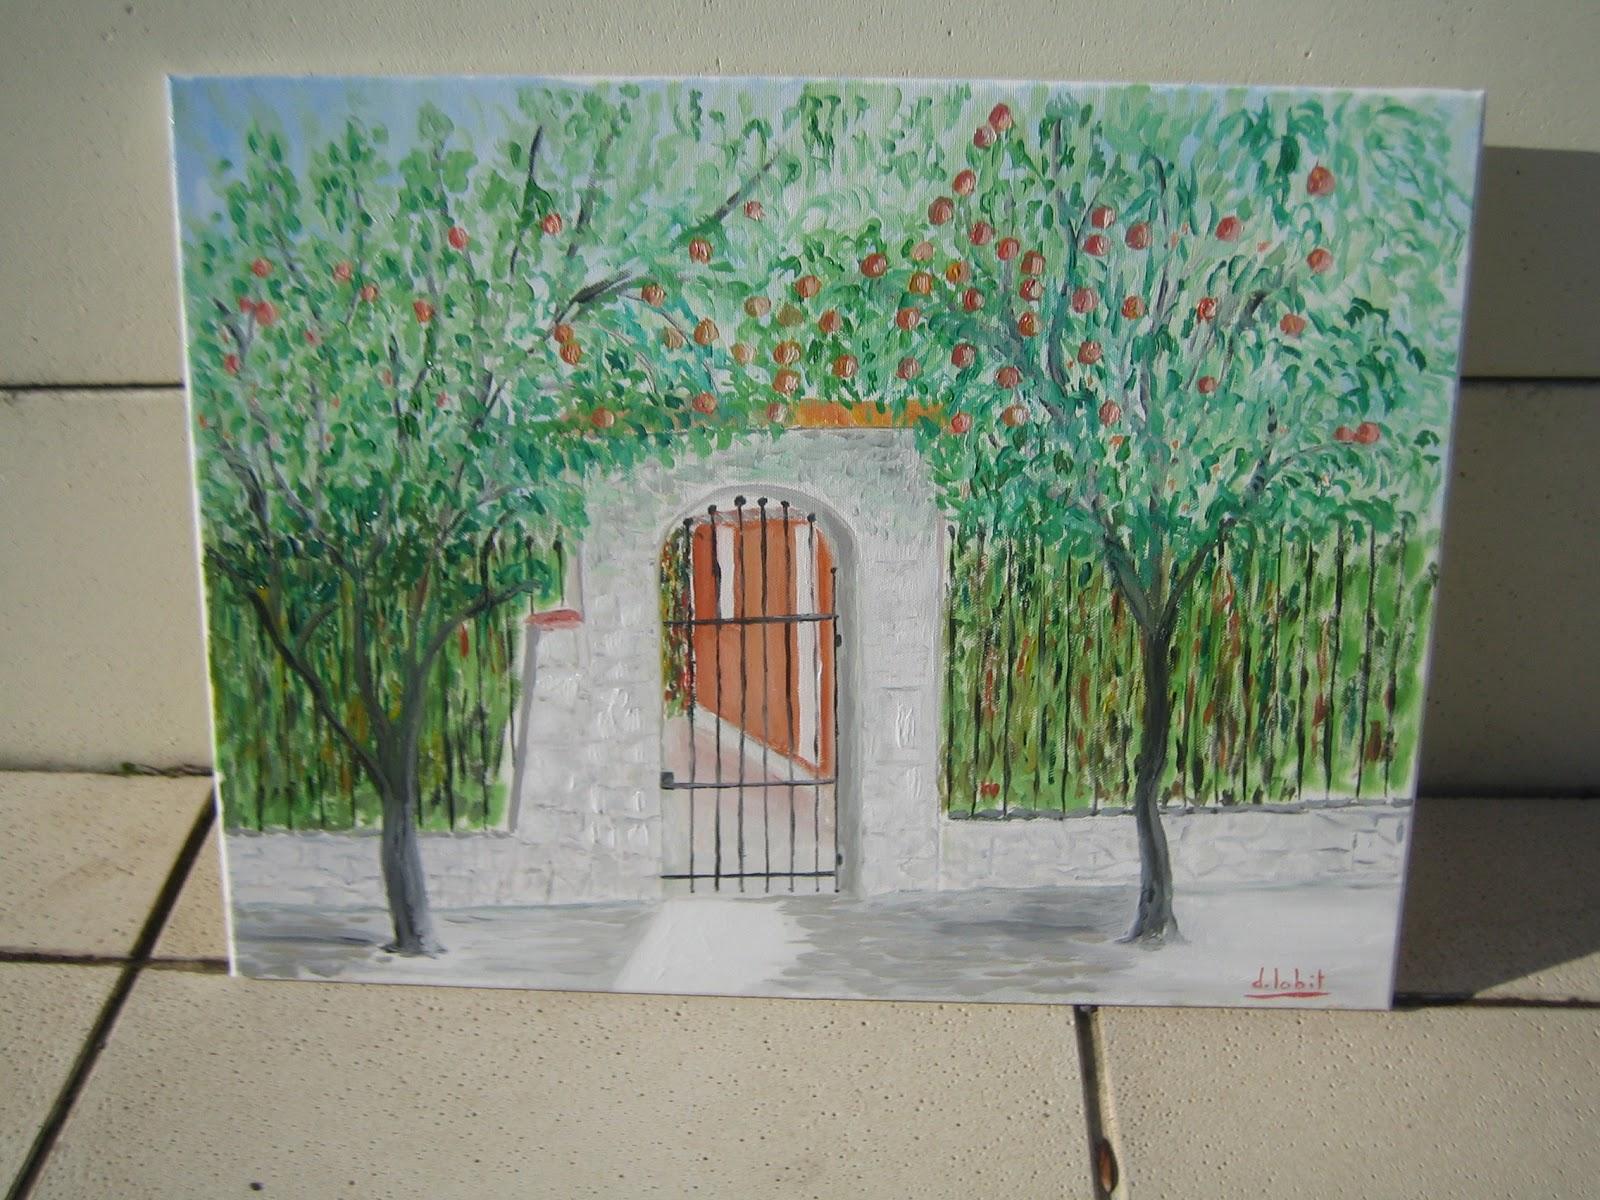 antifraise antifraise peinture des orangers decoratifs. Black Bedroom Furniture Sets. Home Design Ideas